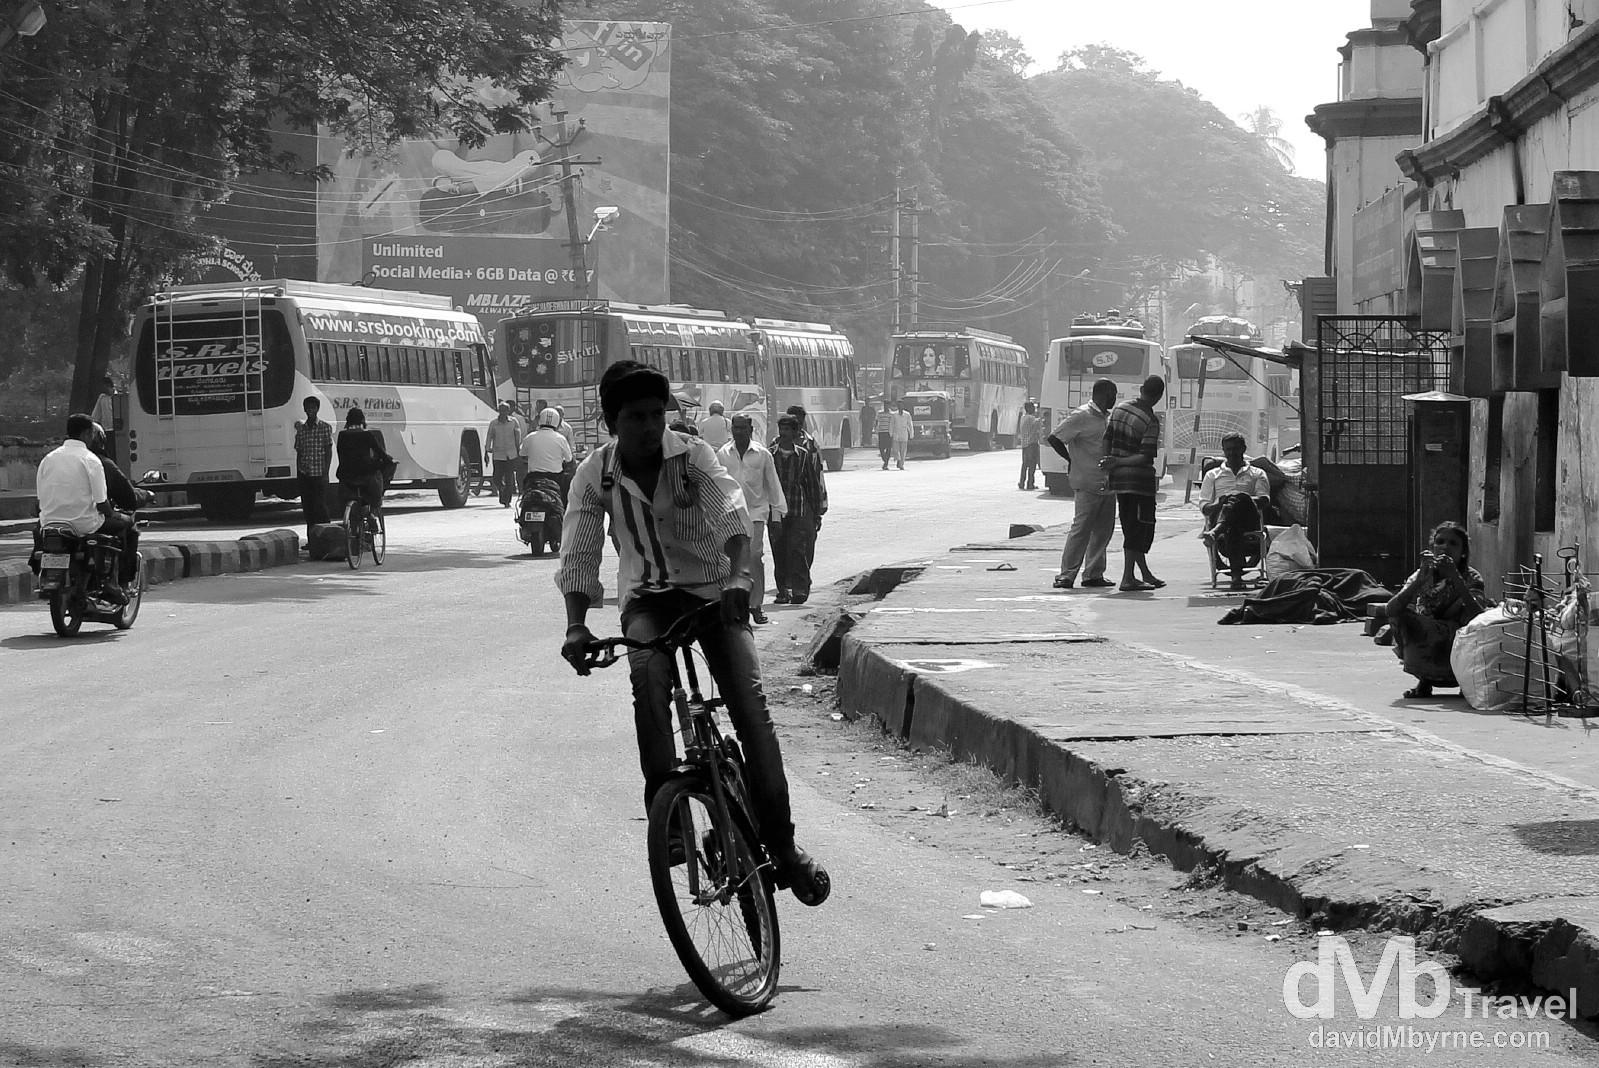 On the streets of Mysore, Karnataka, southern India. September 21st 2012.